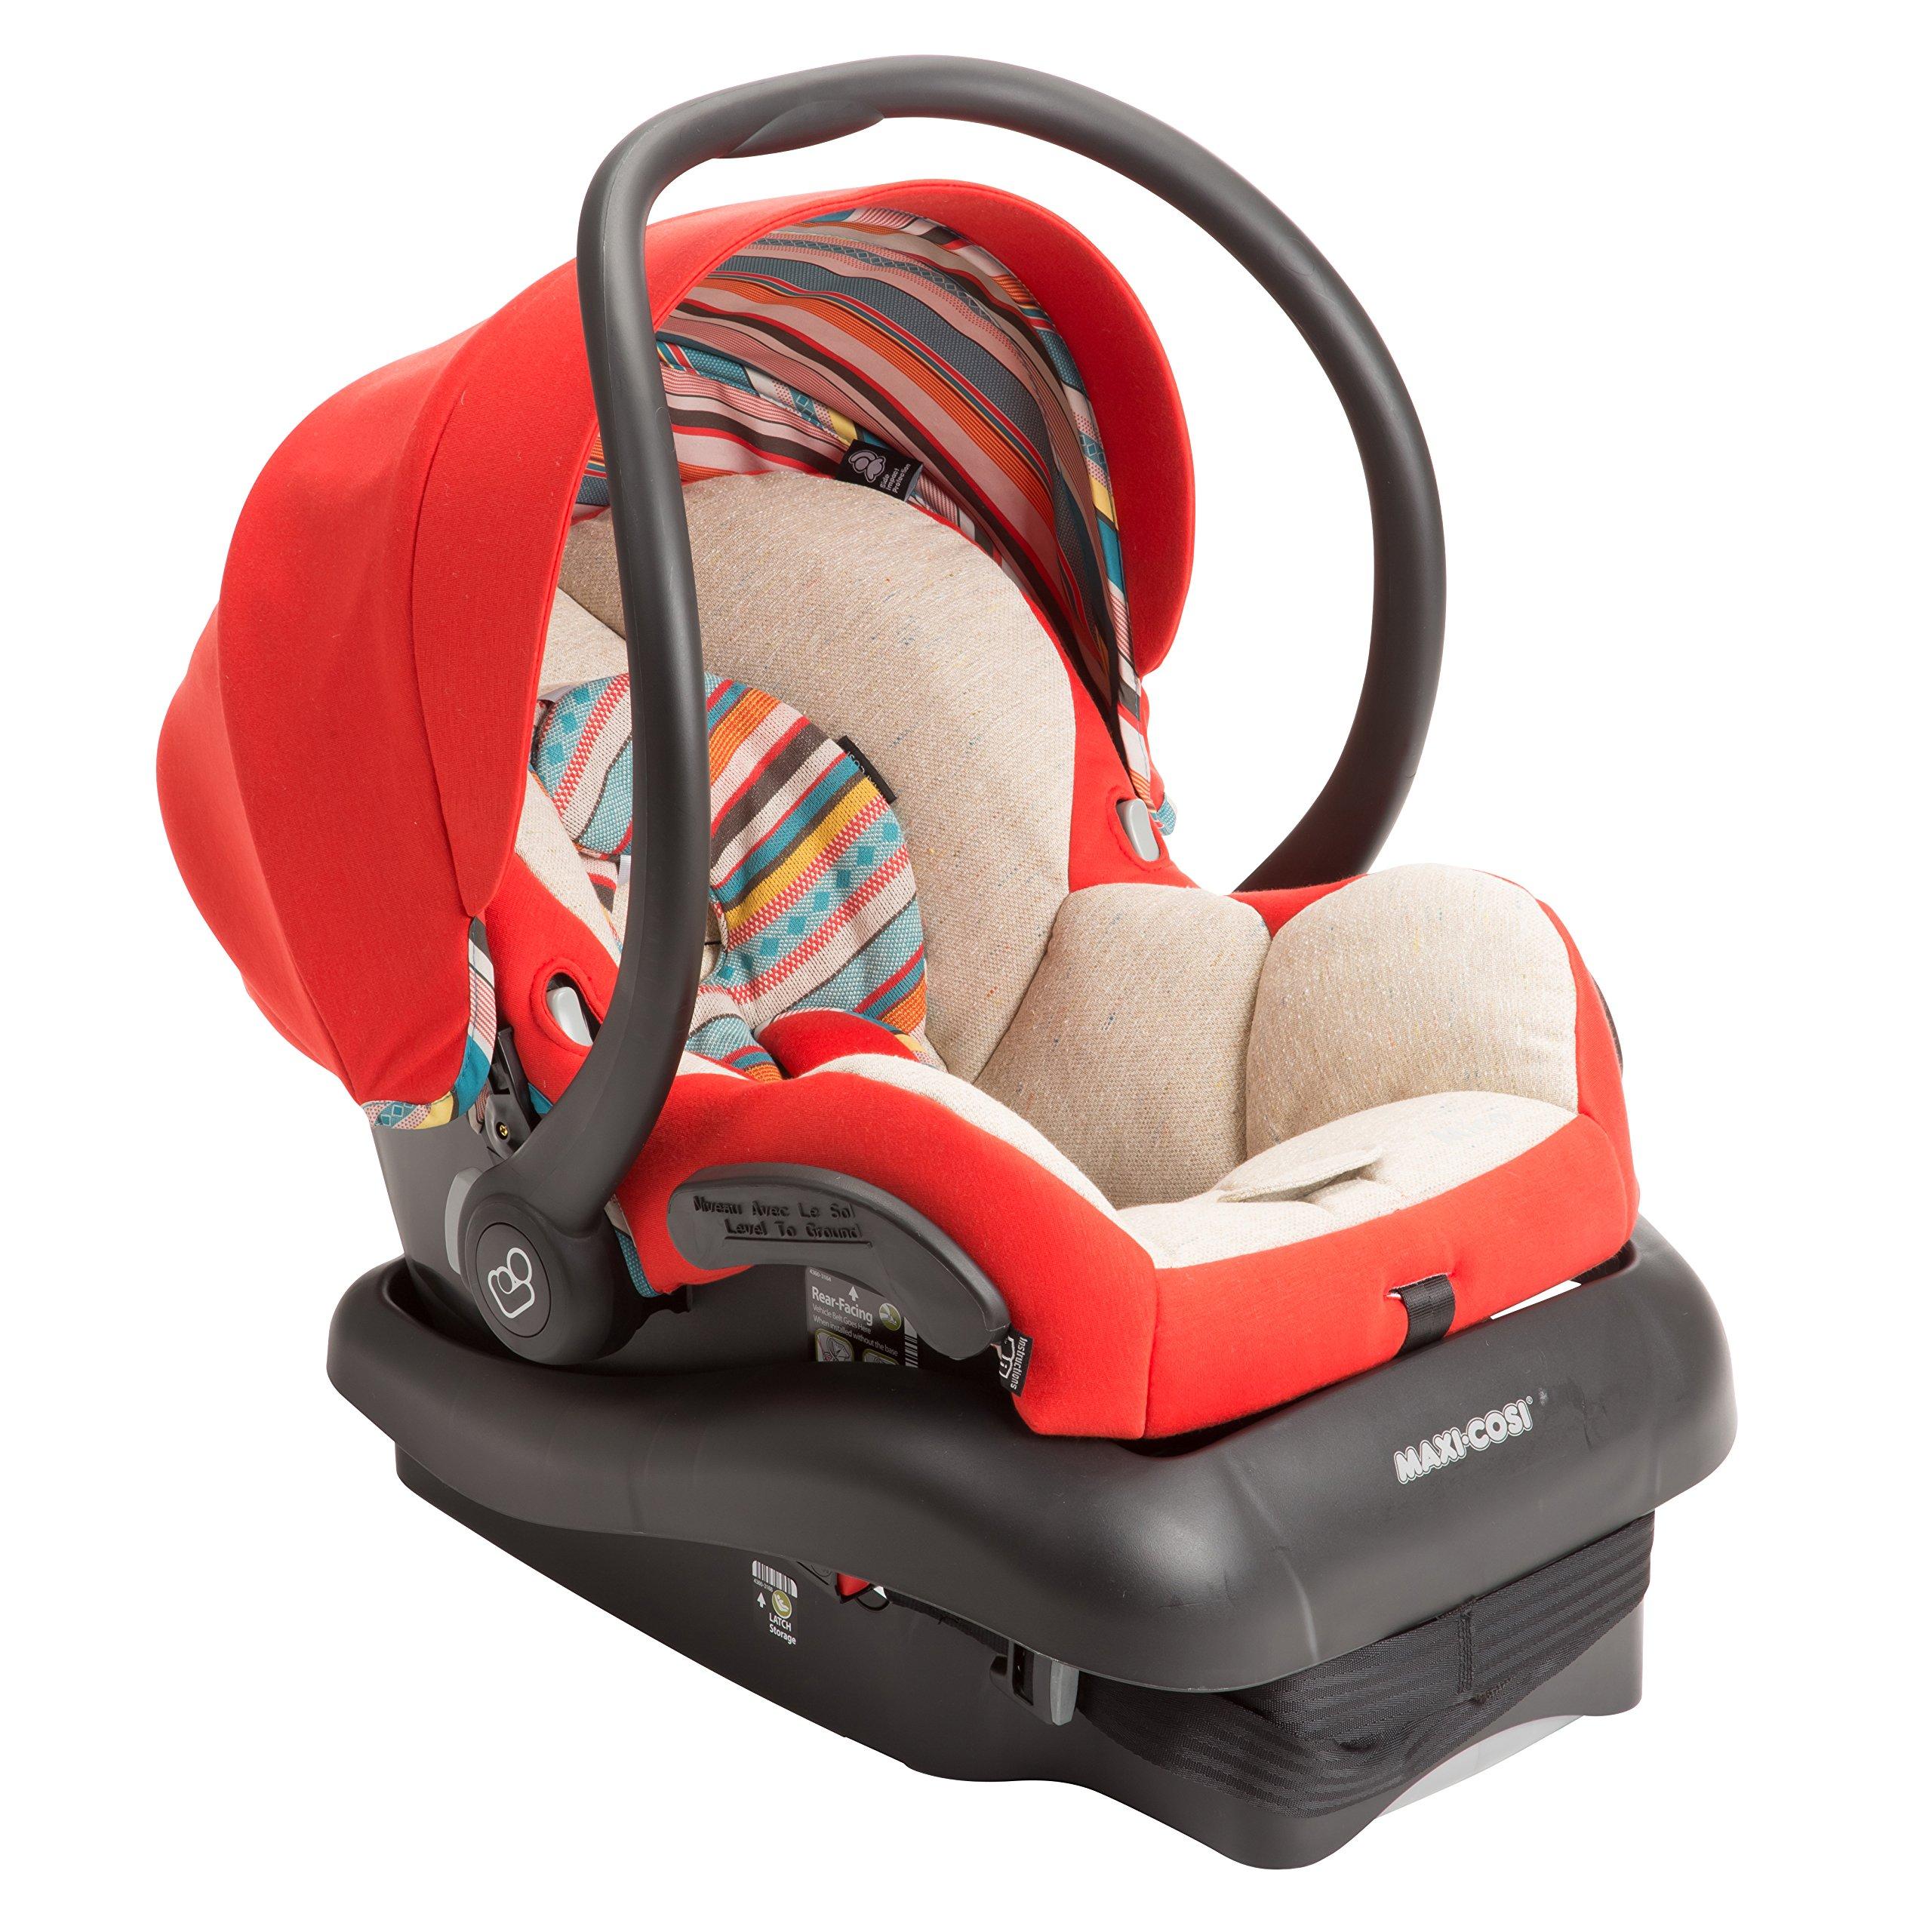 rose com faucets baby maxi dp mico bright cosi blue infant amazon vivid car seat